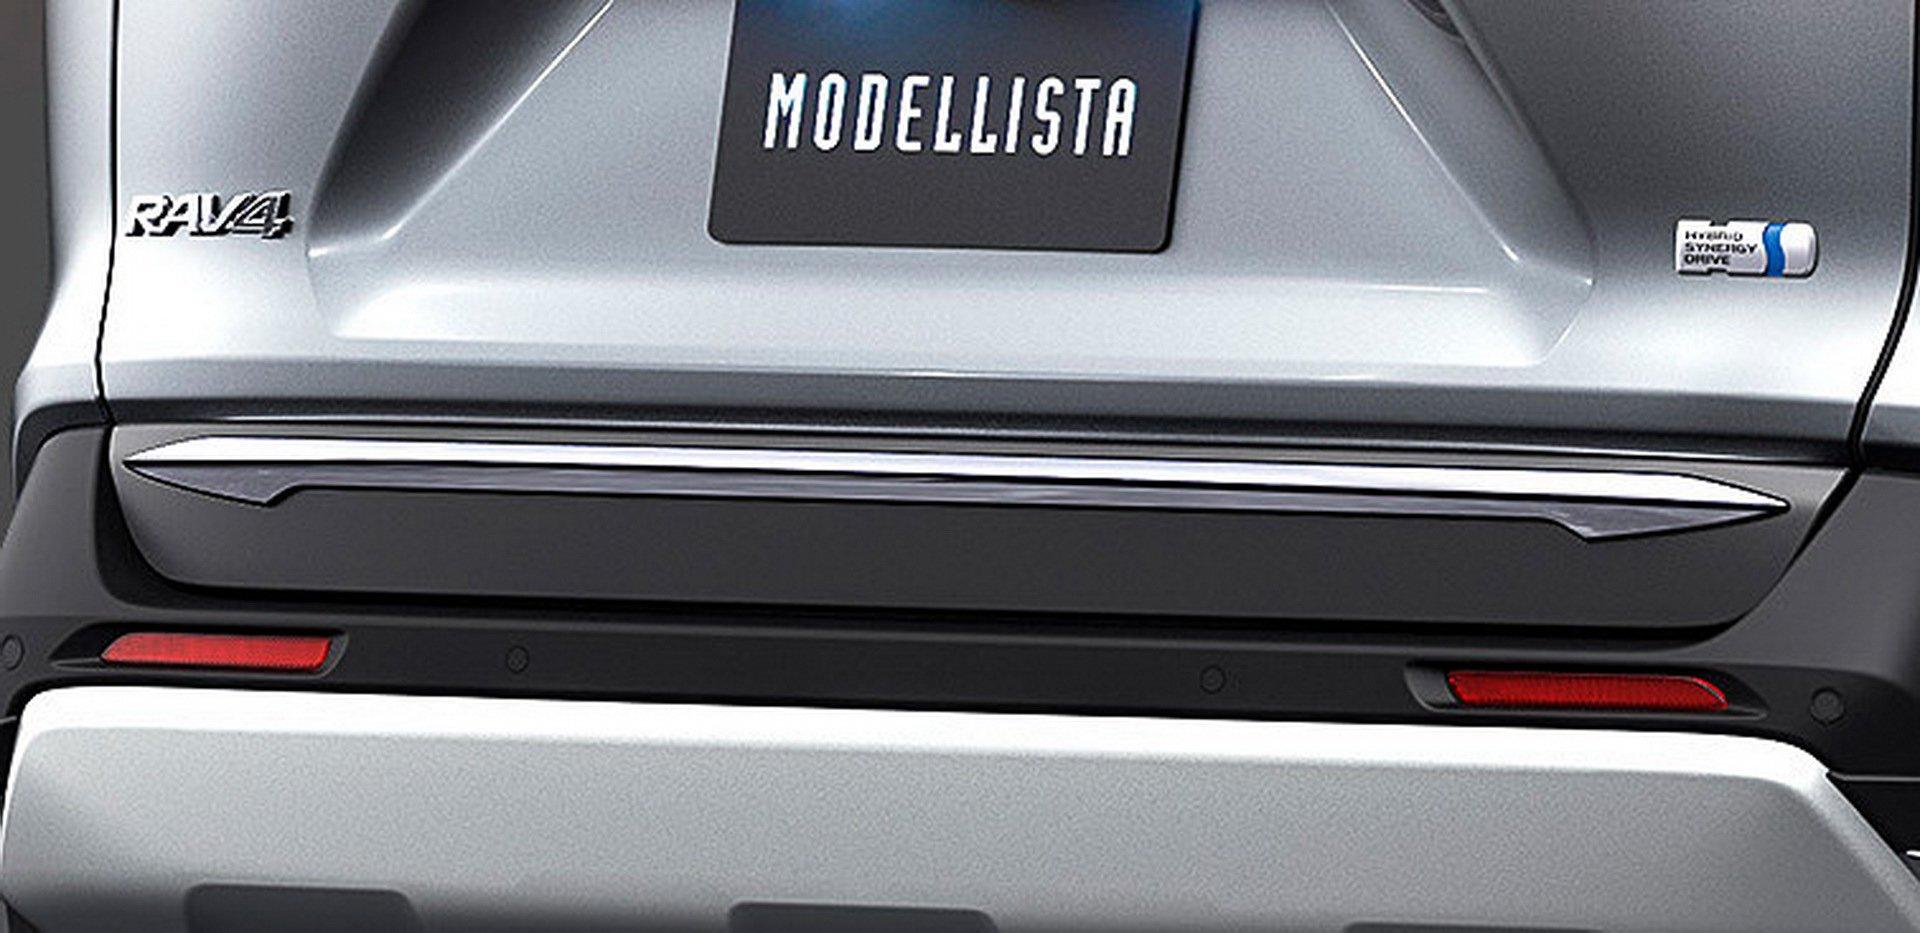 Toyota-RAV4-TRD-and-Modellista-14